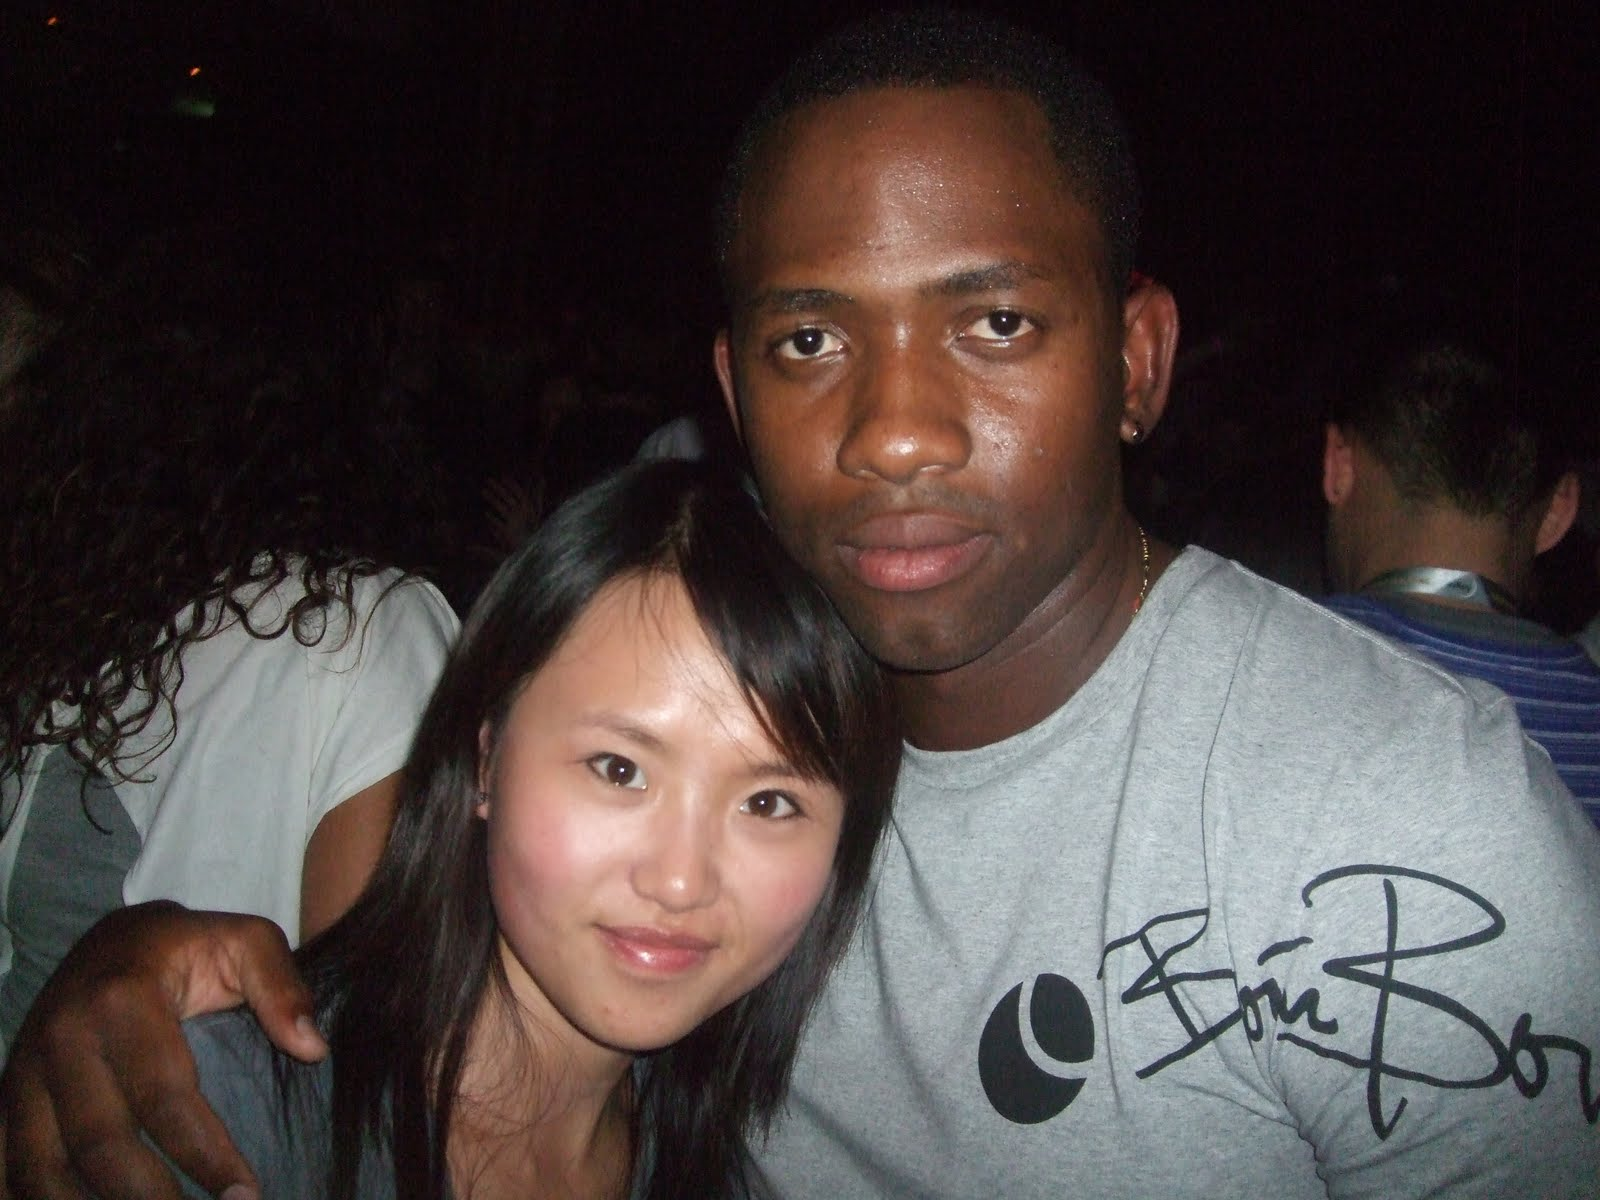 Interracial dating horror stories